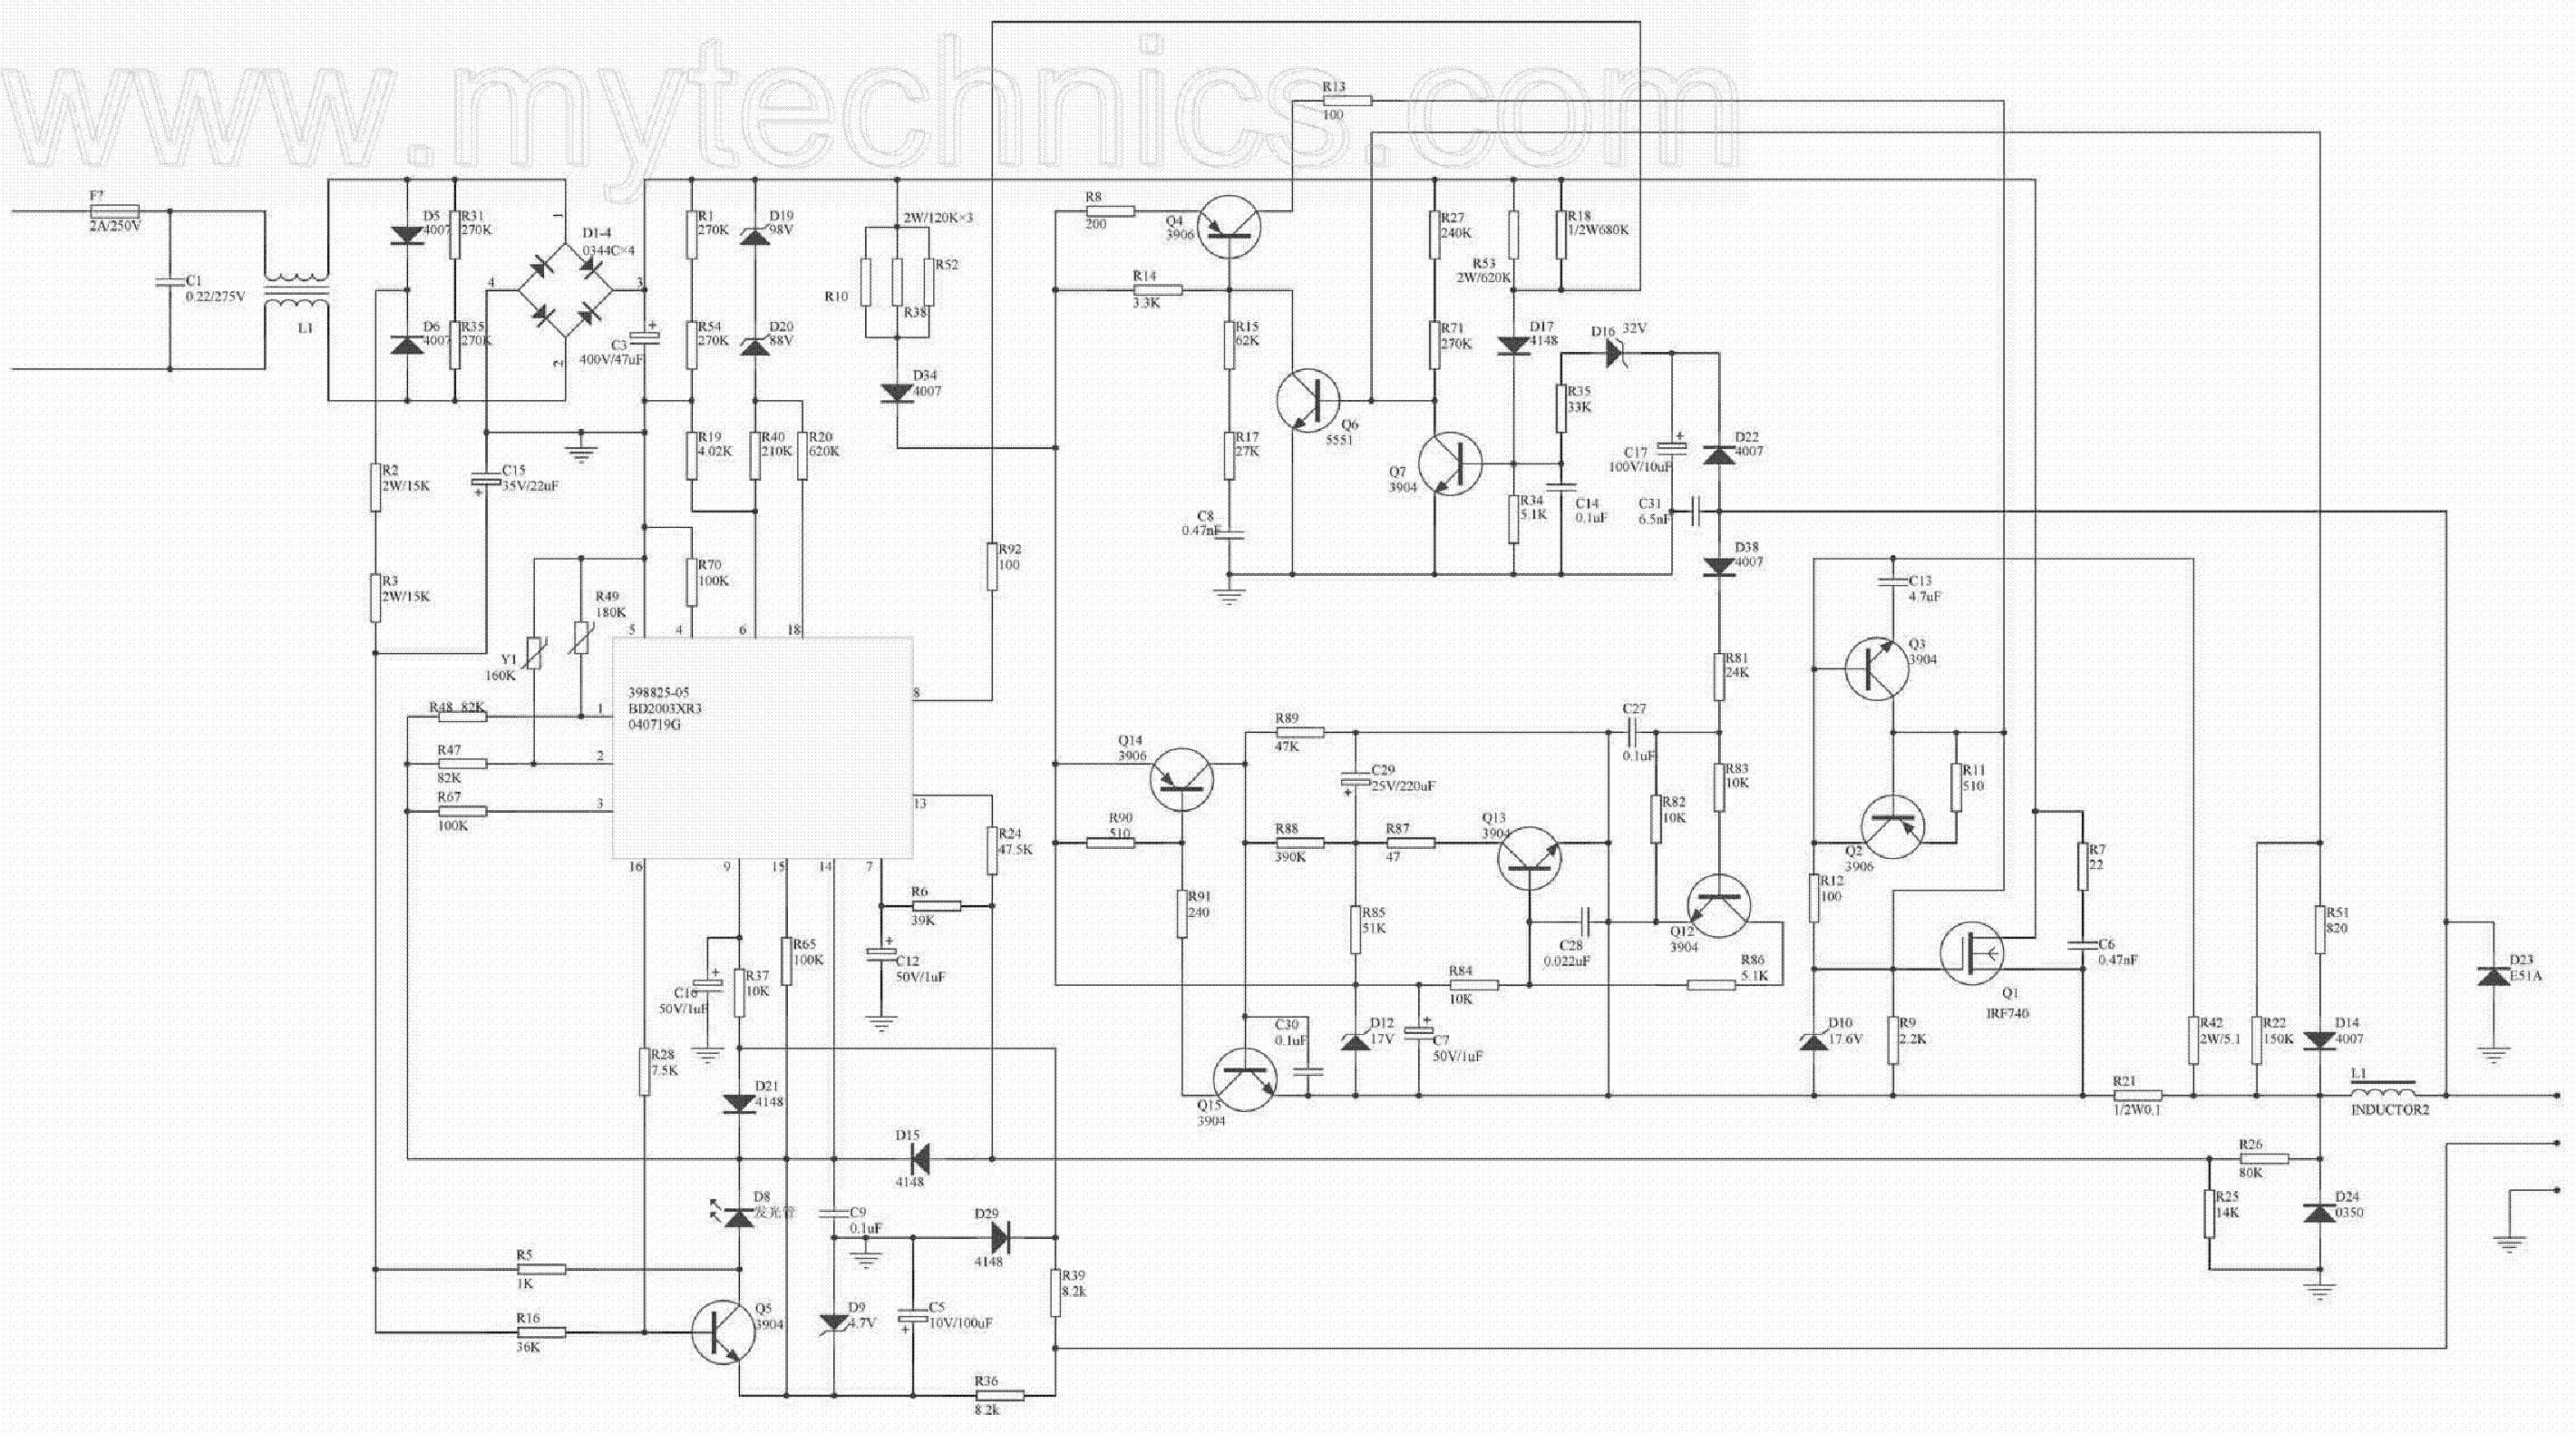 Dewalt De9116 Power Supply Service Manual Download, Schematics De Walt  Warranty De Walt Schematics